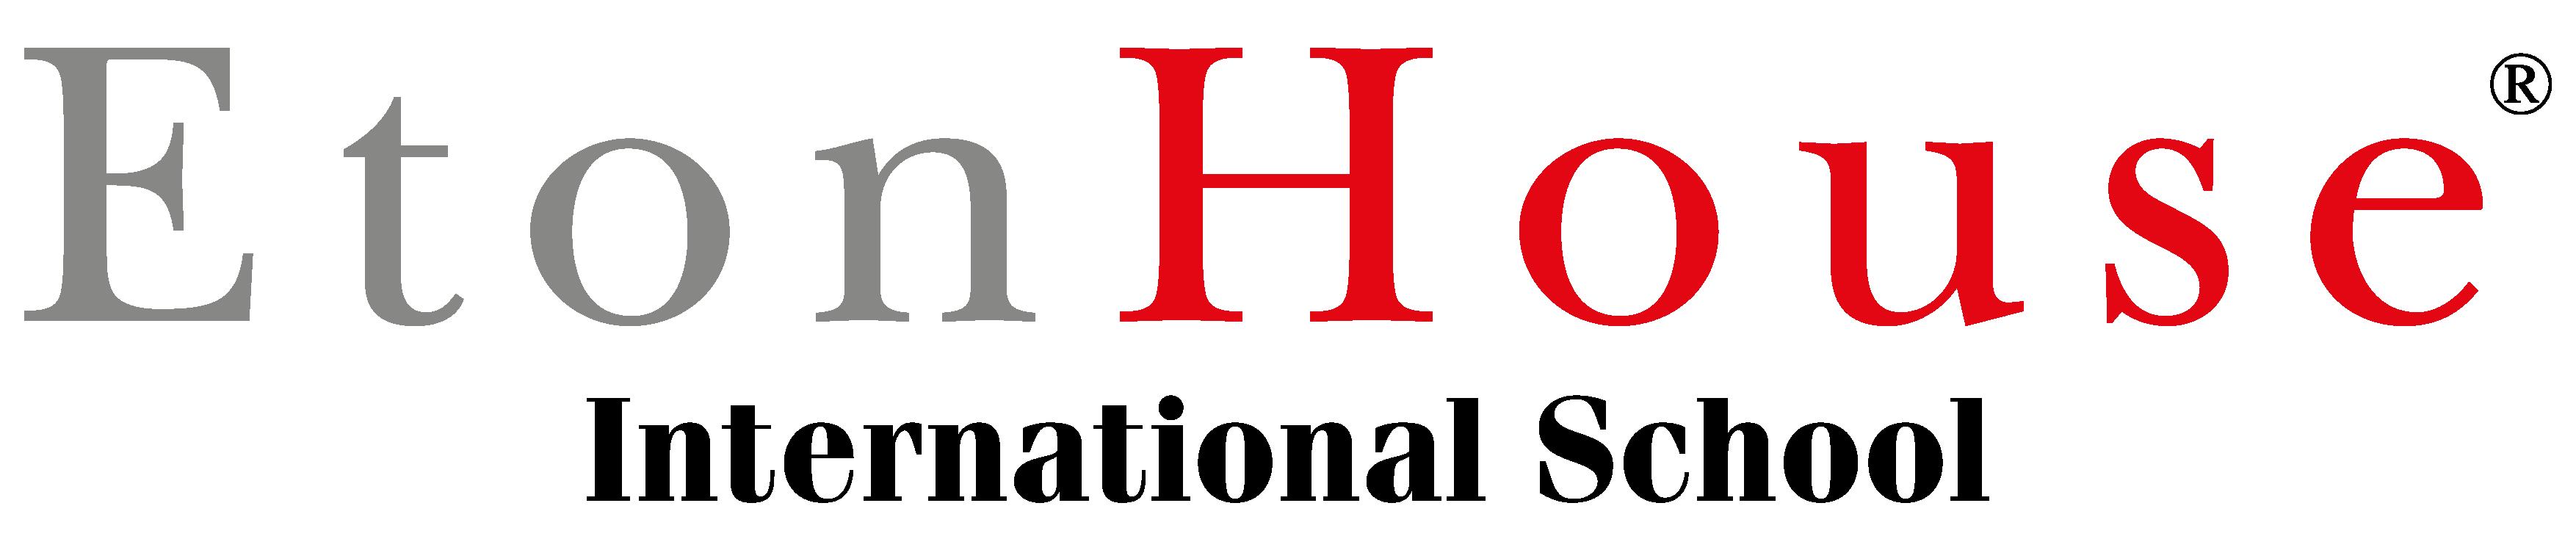 EtonHouse International School logo